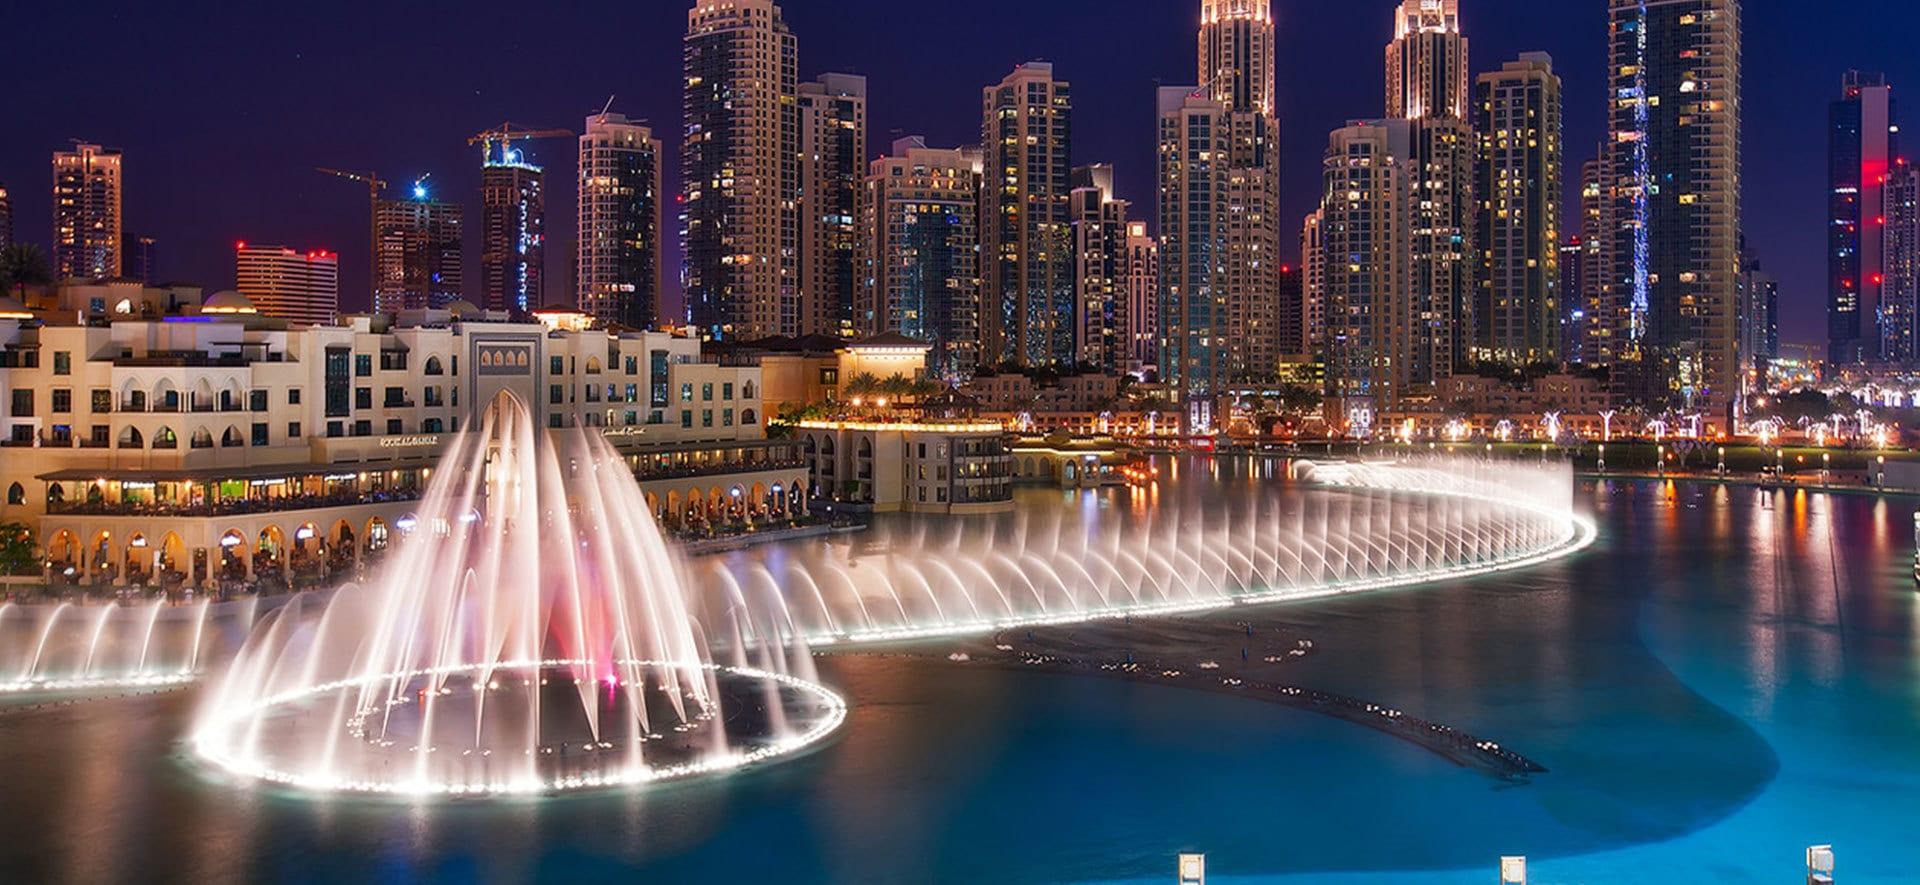 Dubai Fountain show timing & pricing